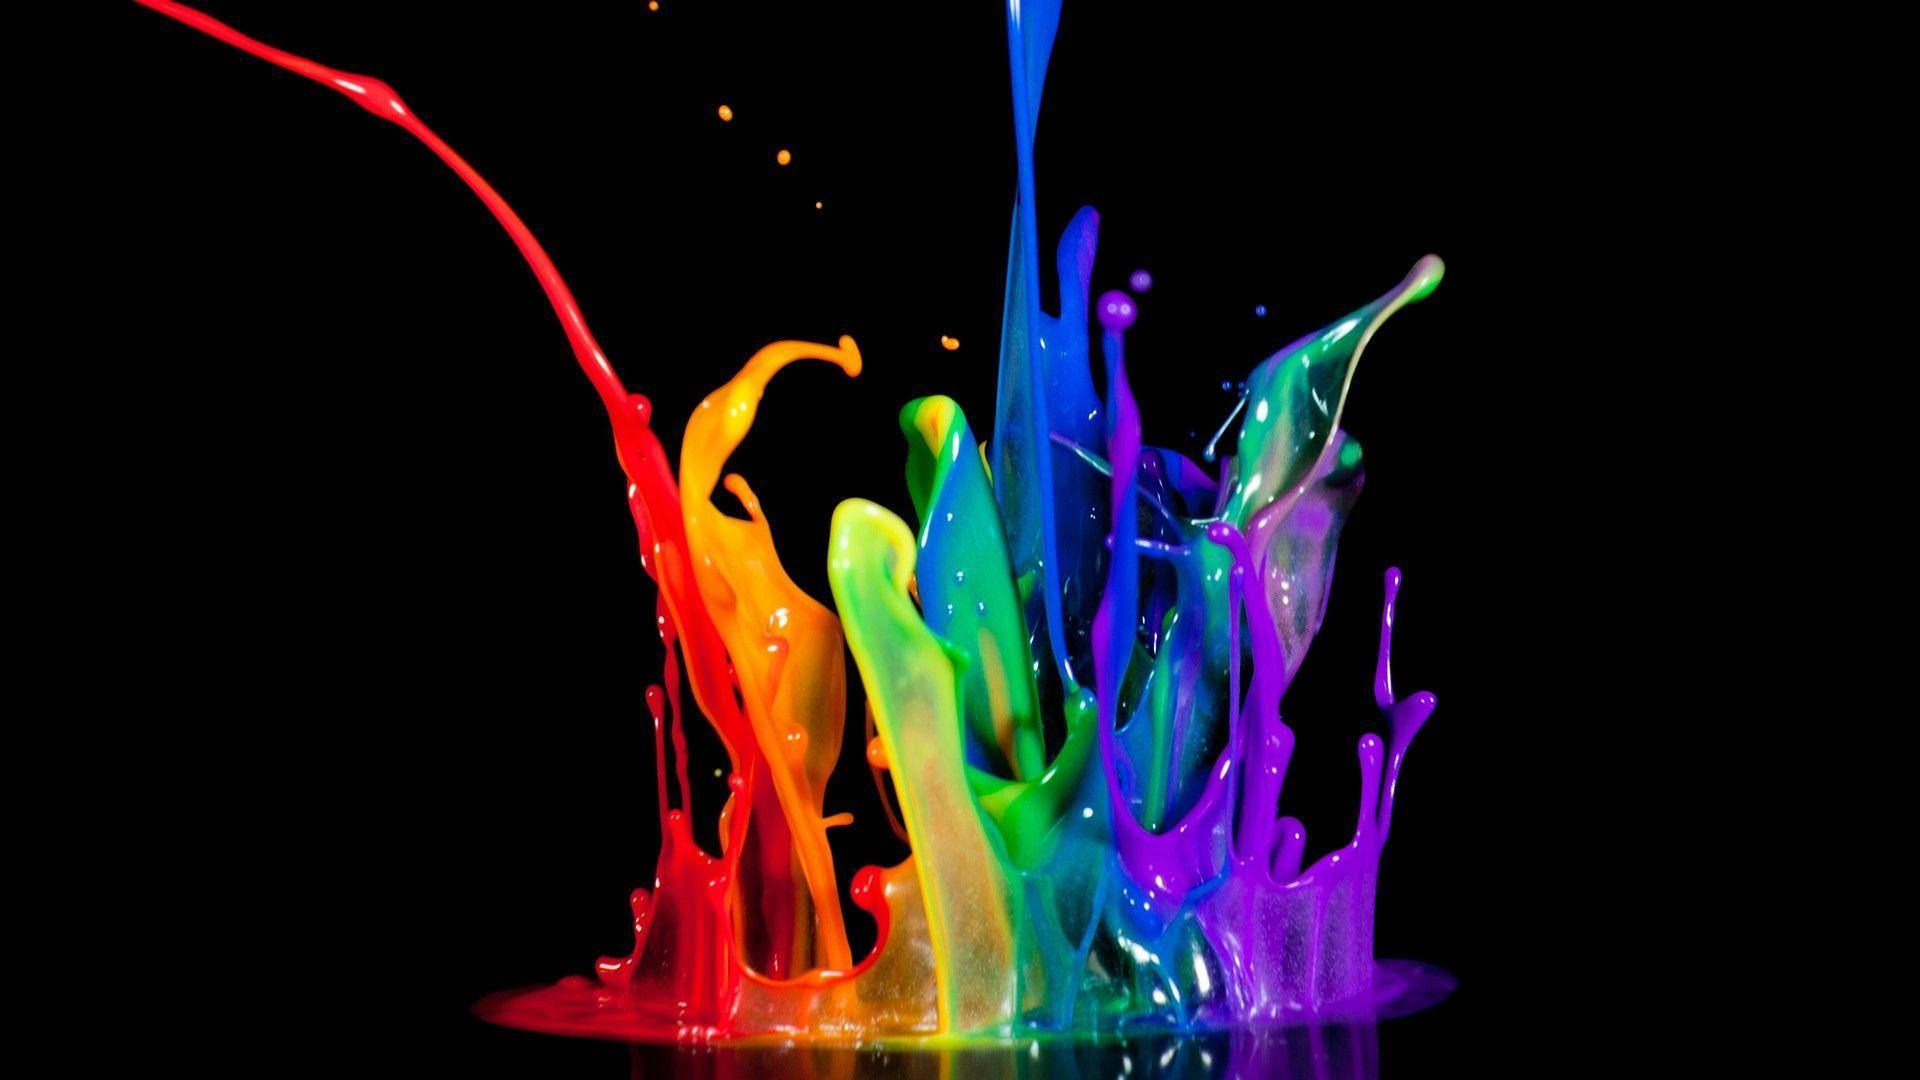 Wallpaper iphone hitam - Color Splash Wallpaper Iphone Wallpaper Facebook Cover Twitter